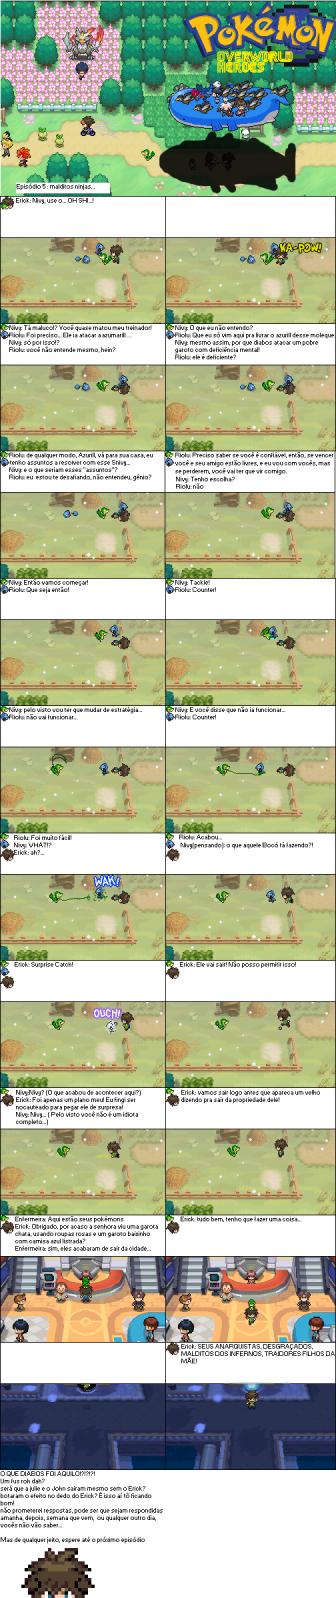 Pokémon Overworld Heroes [+72] Uo6jm